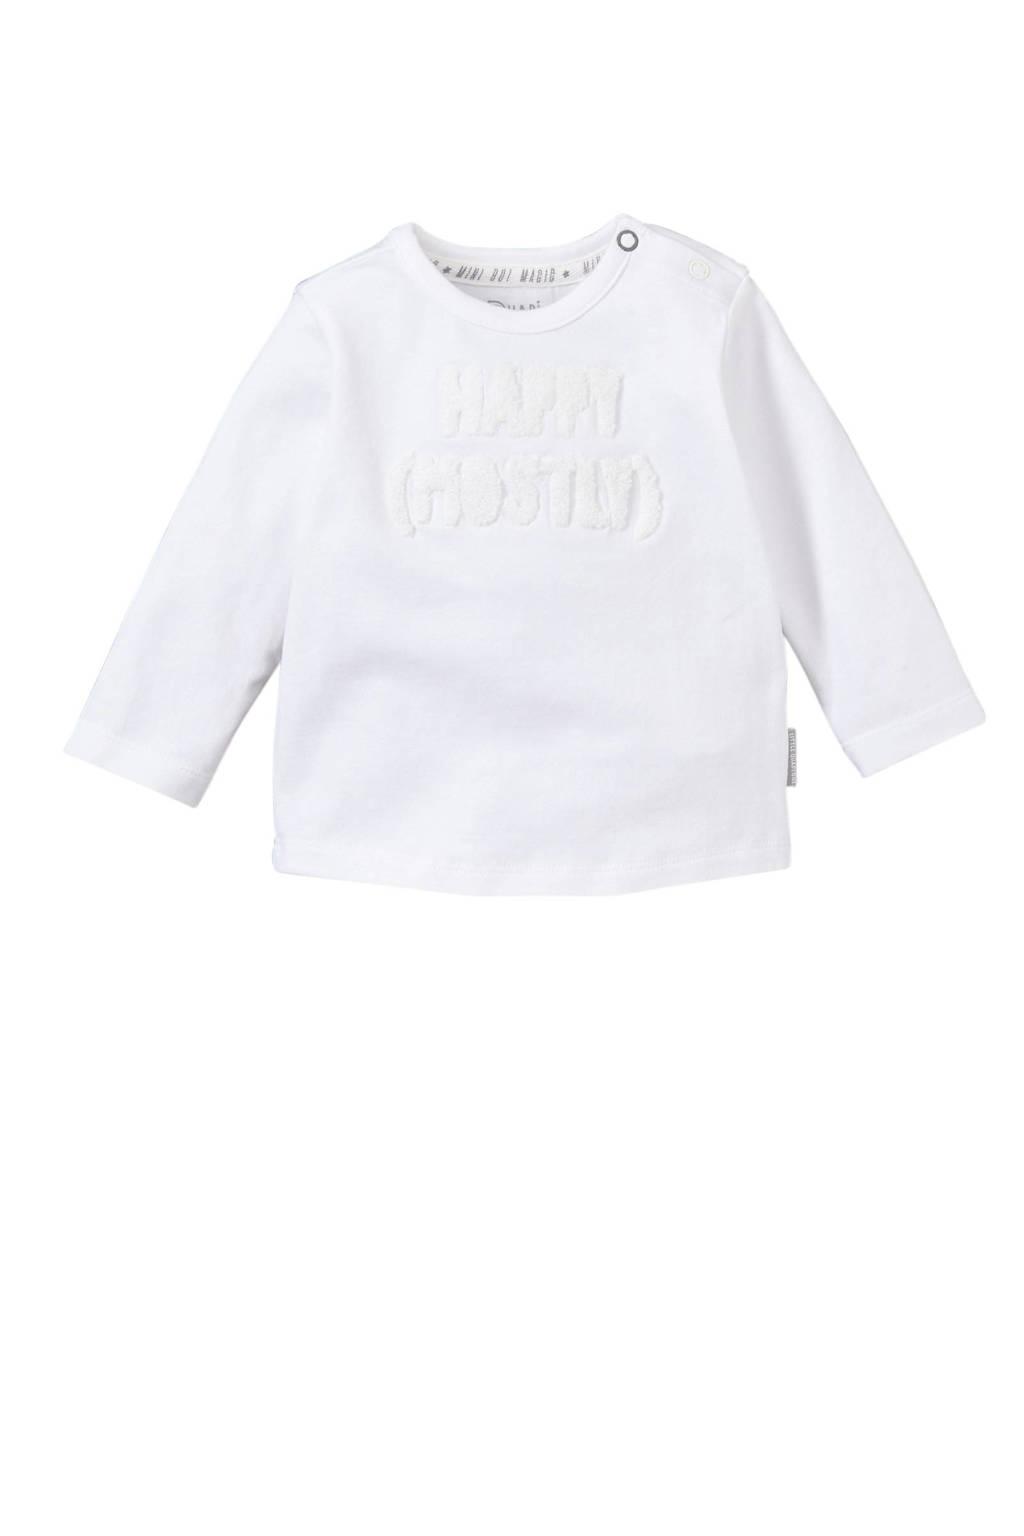 Quapi baby longsleeve Xari met tekst wit, Wit